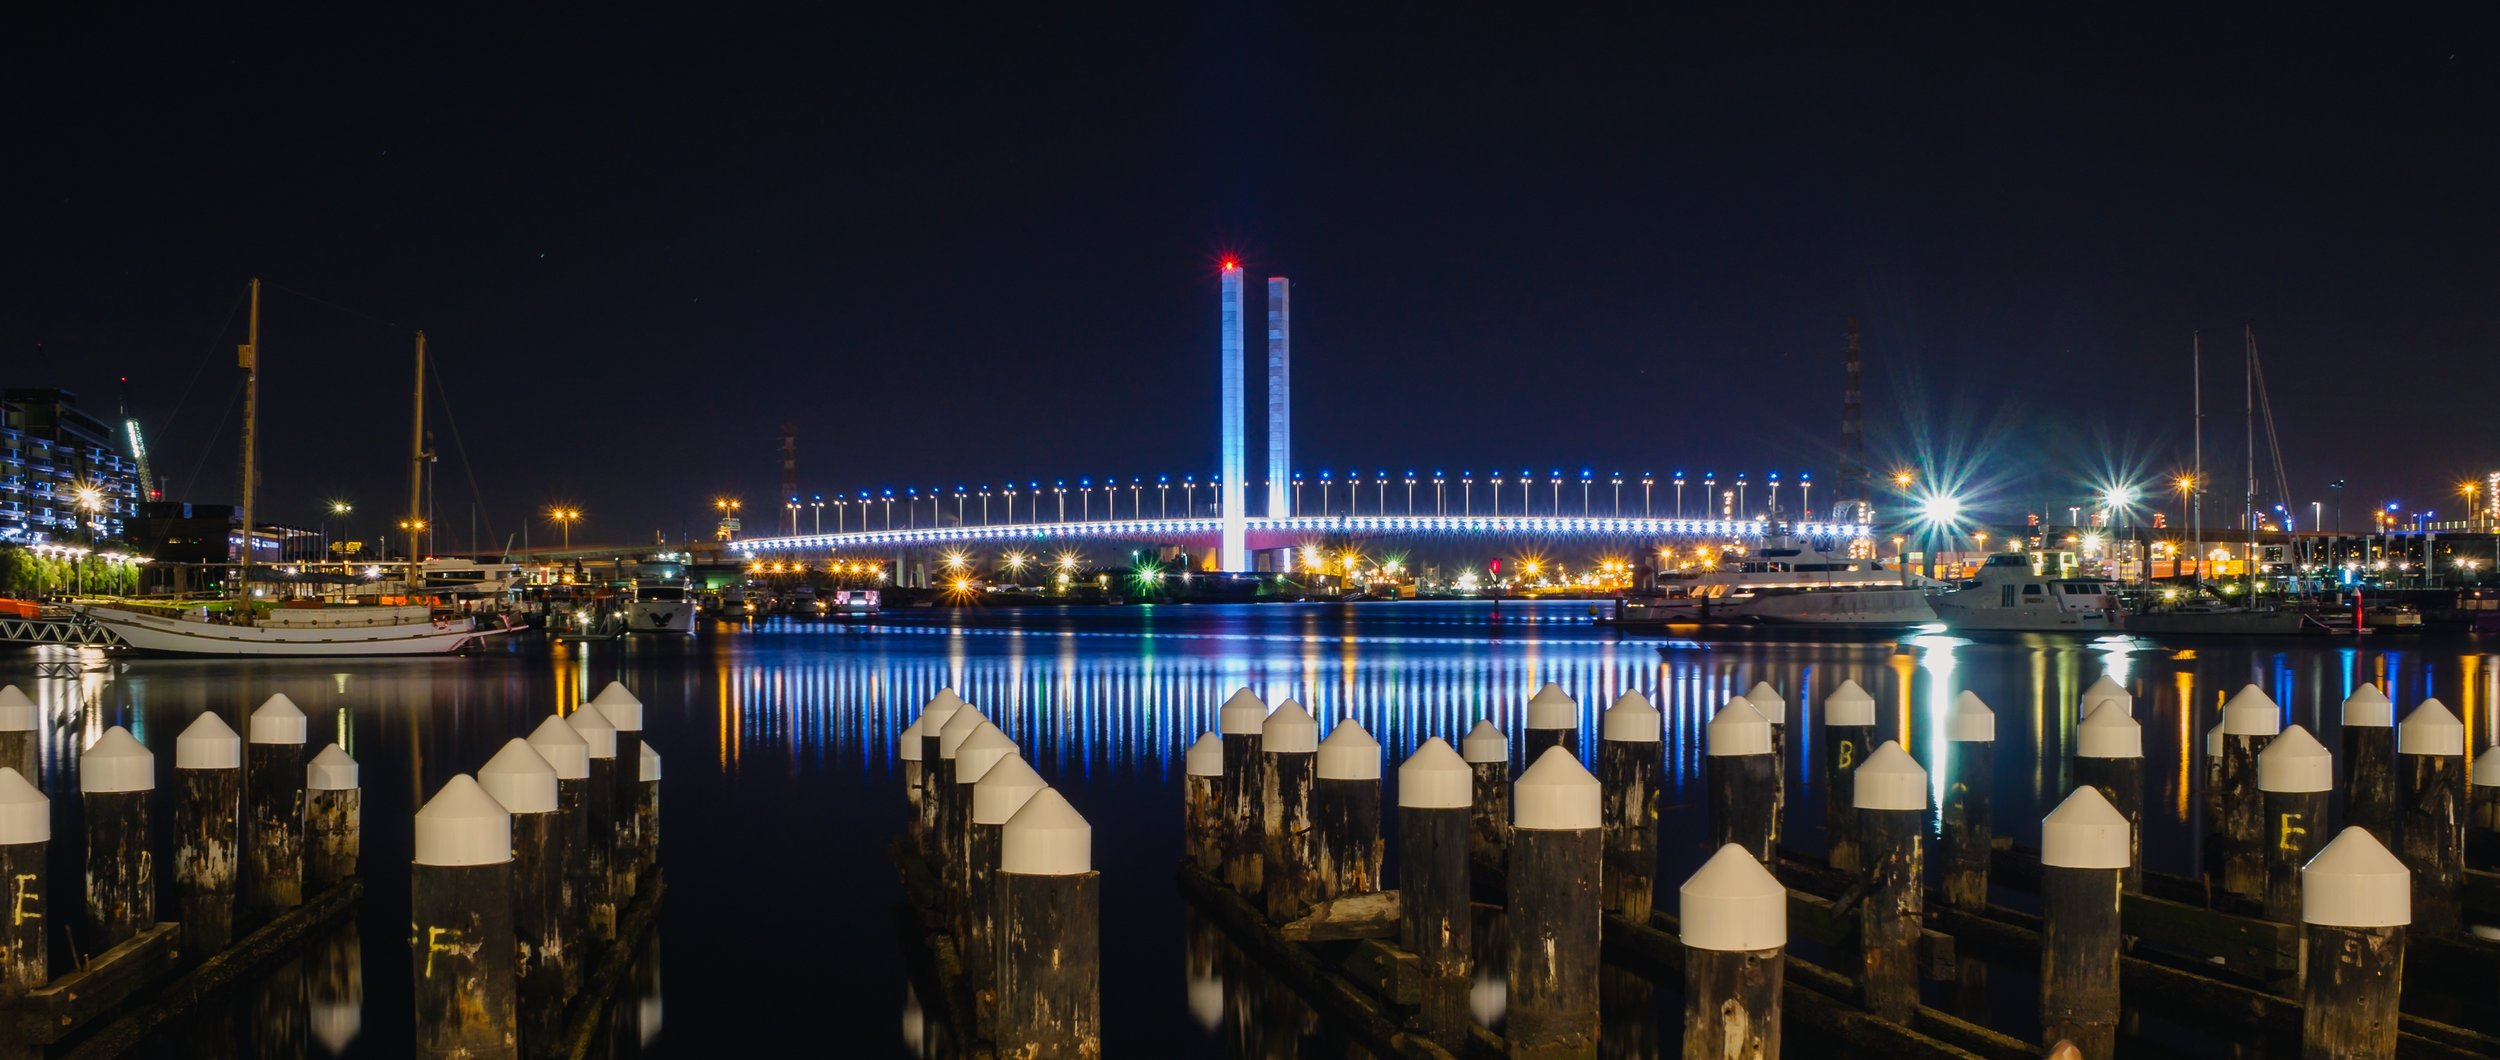 Melbourne bridge and water.jpg